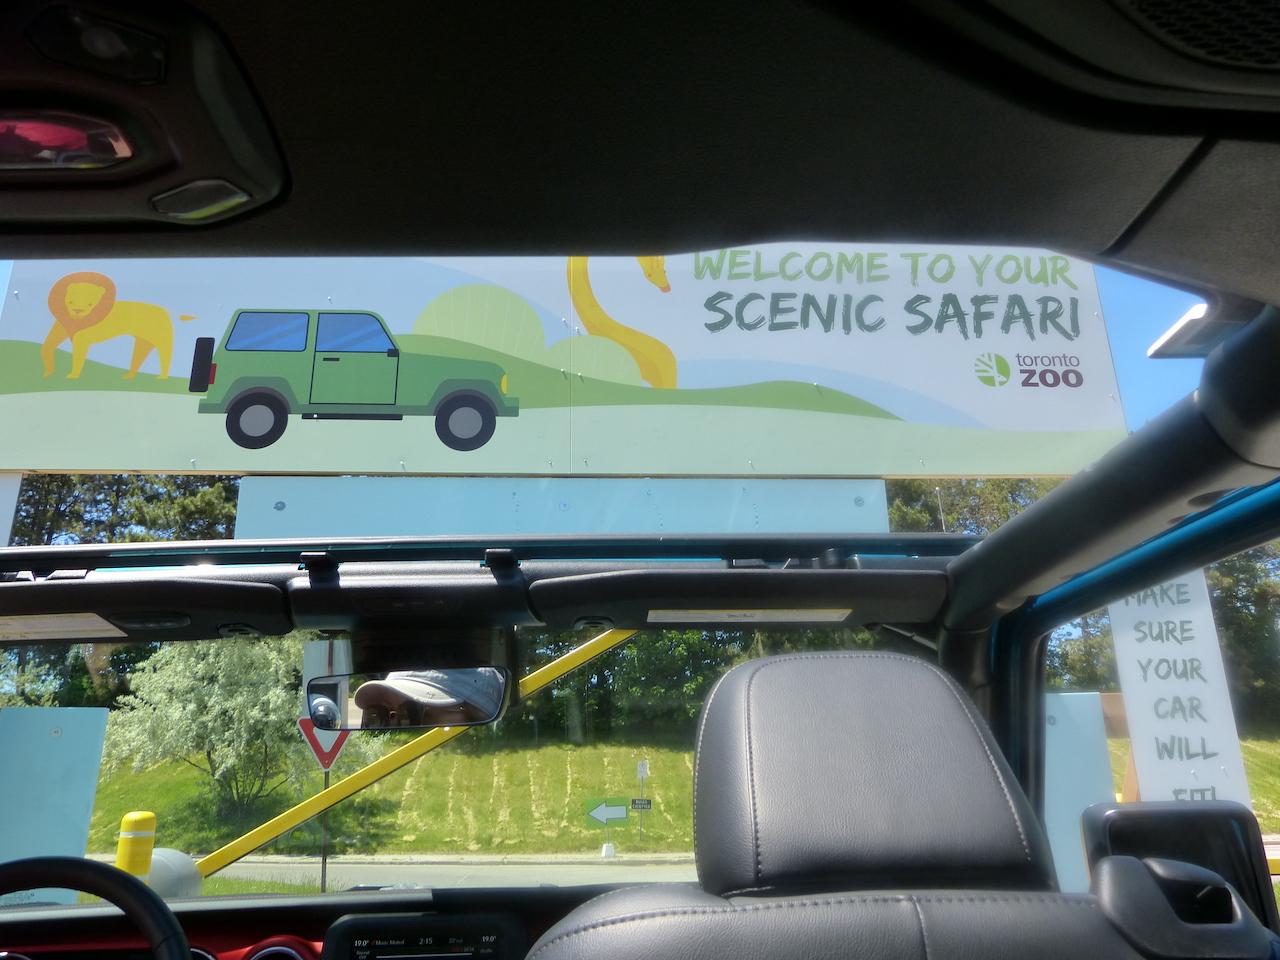 Scenic Safari